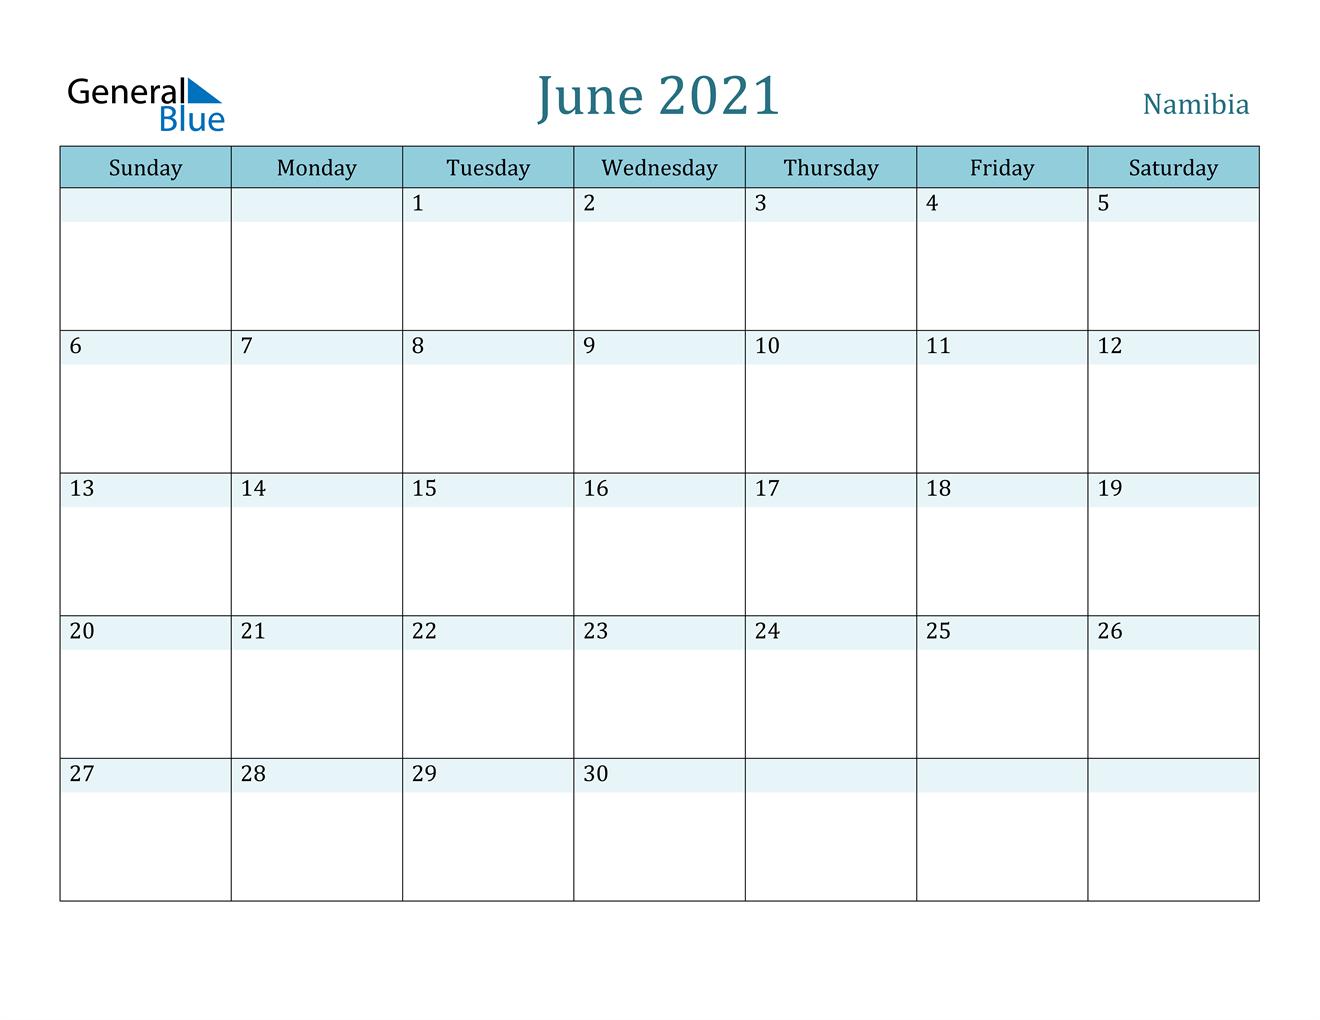 June 2021 Calendar - Namibia